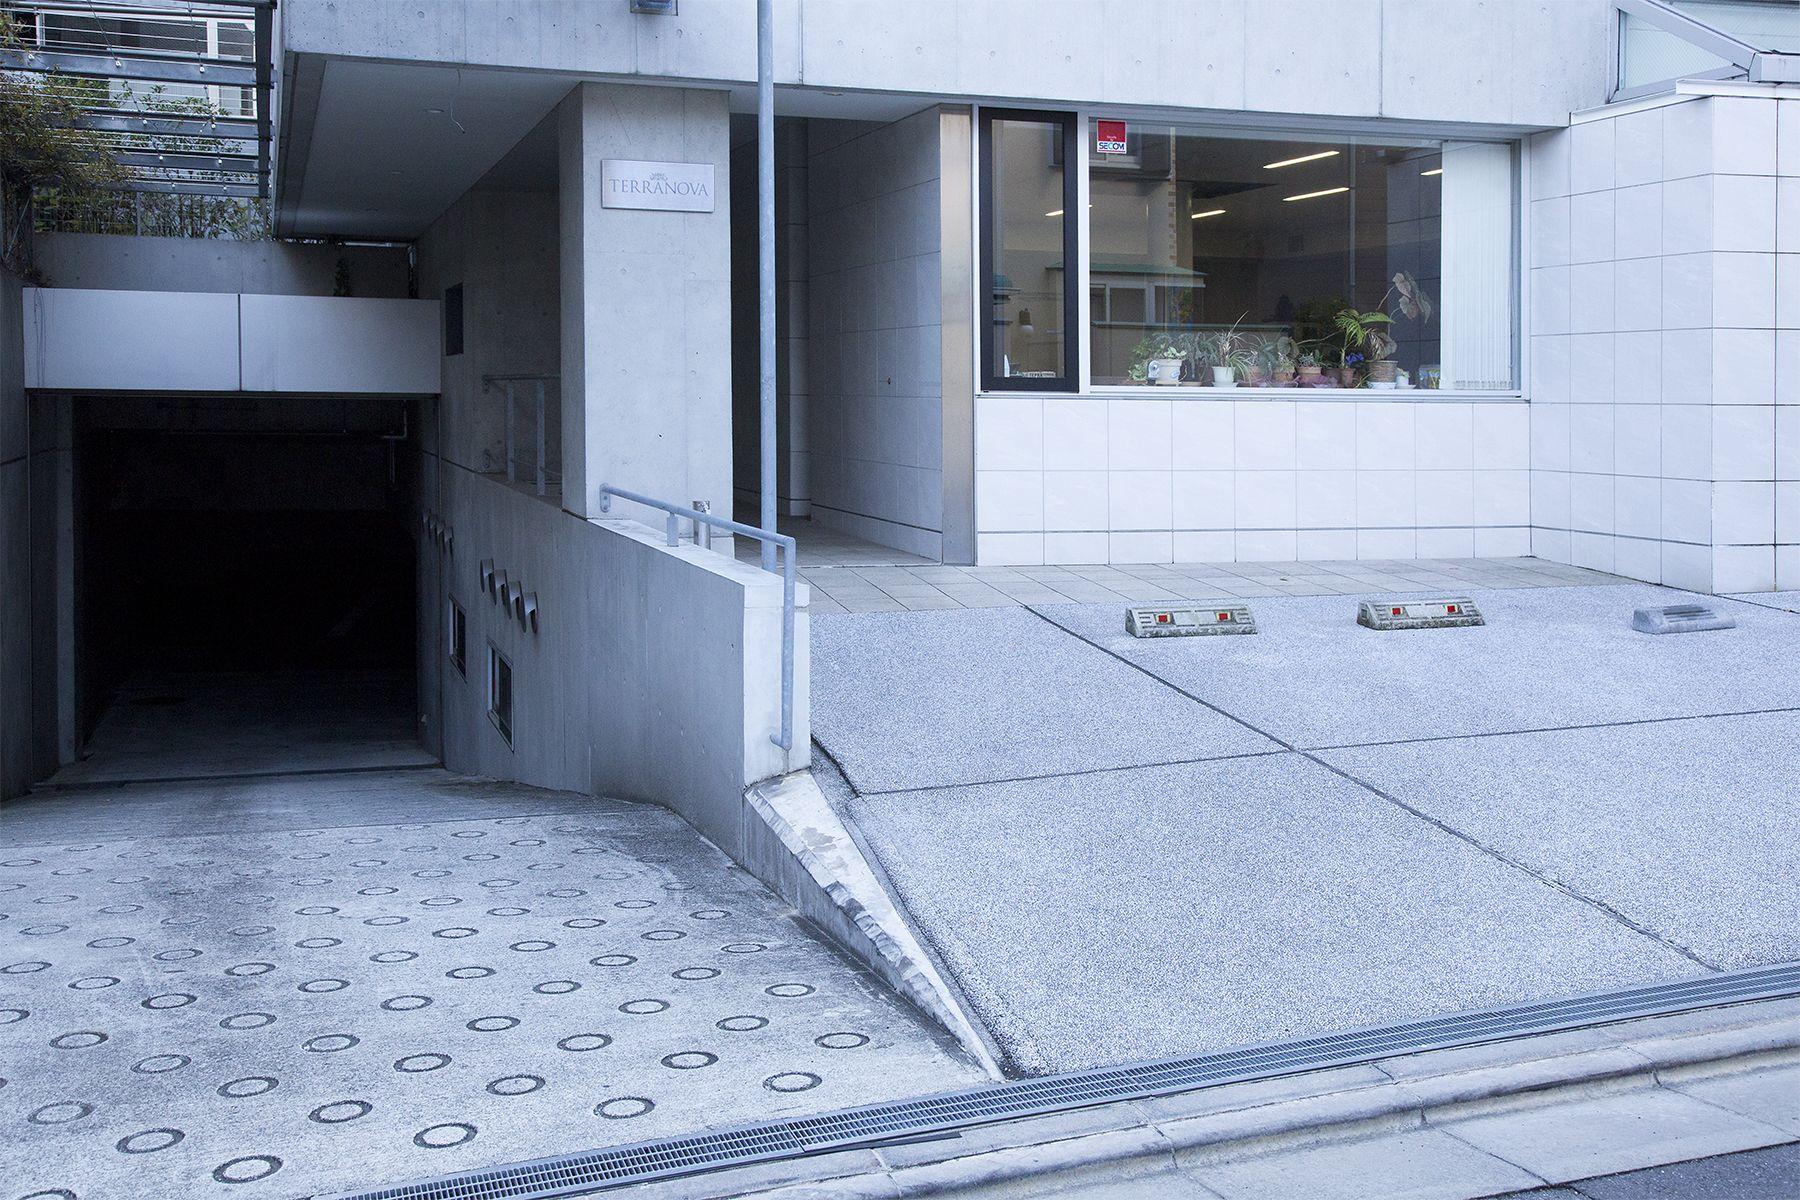 Studio TERRANOVA Dst  キッチン+バルコニー  (スタジオテラノヴァ)スタジオビル前駐車場 最大2台分利用